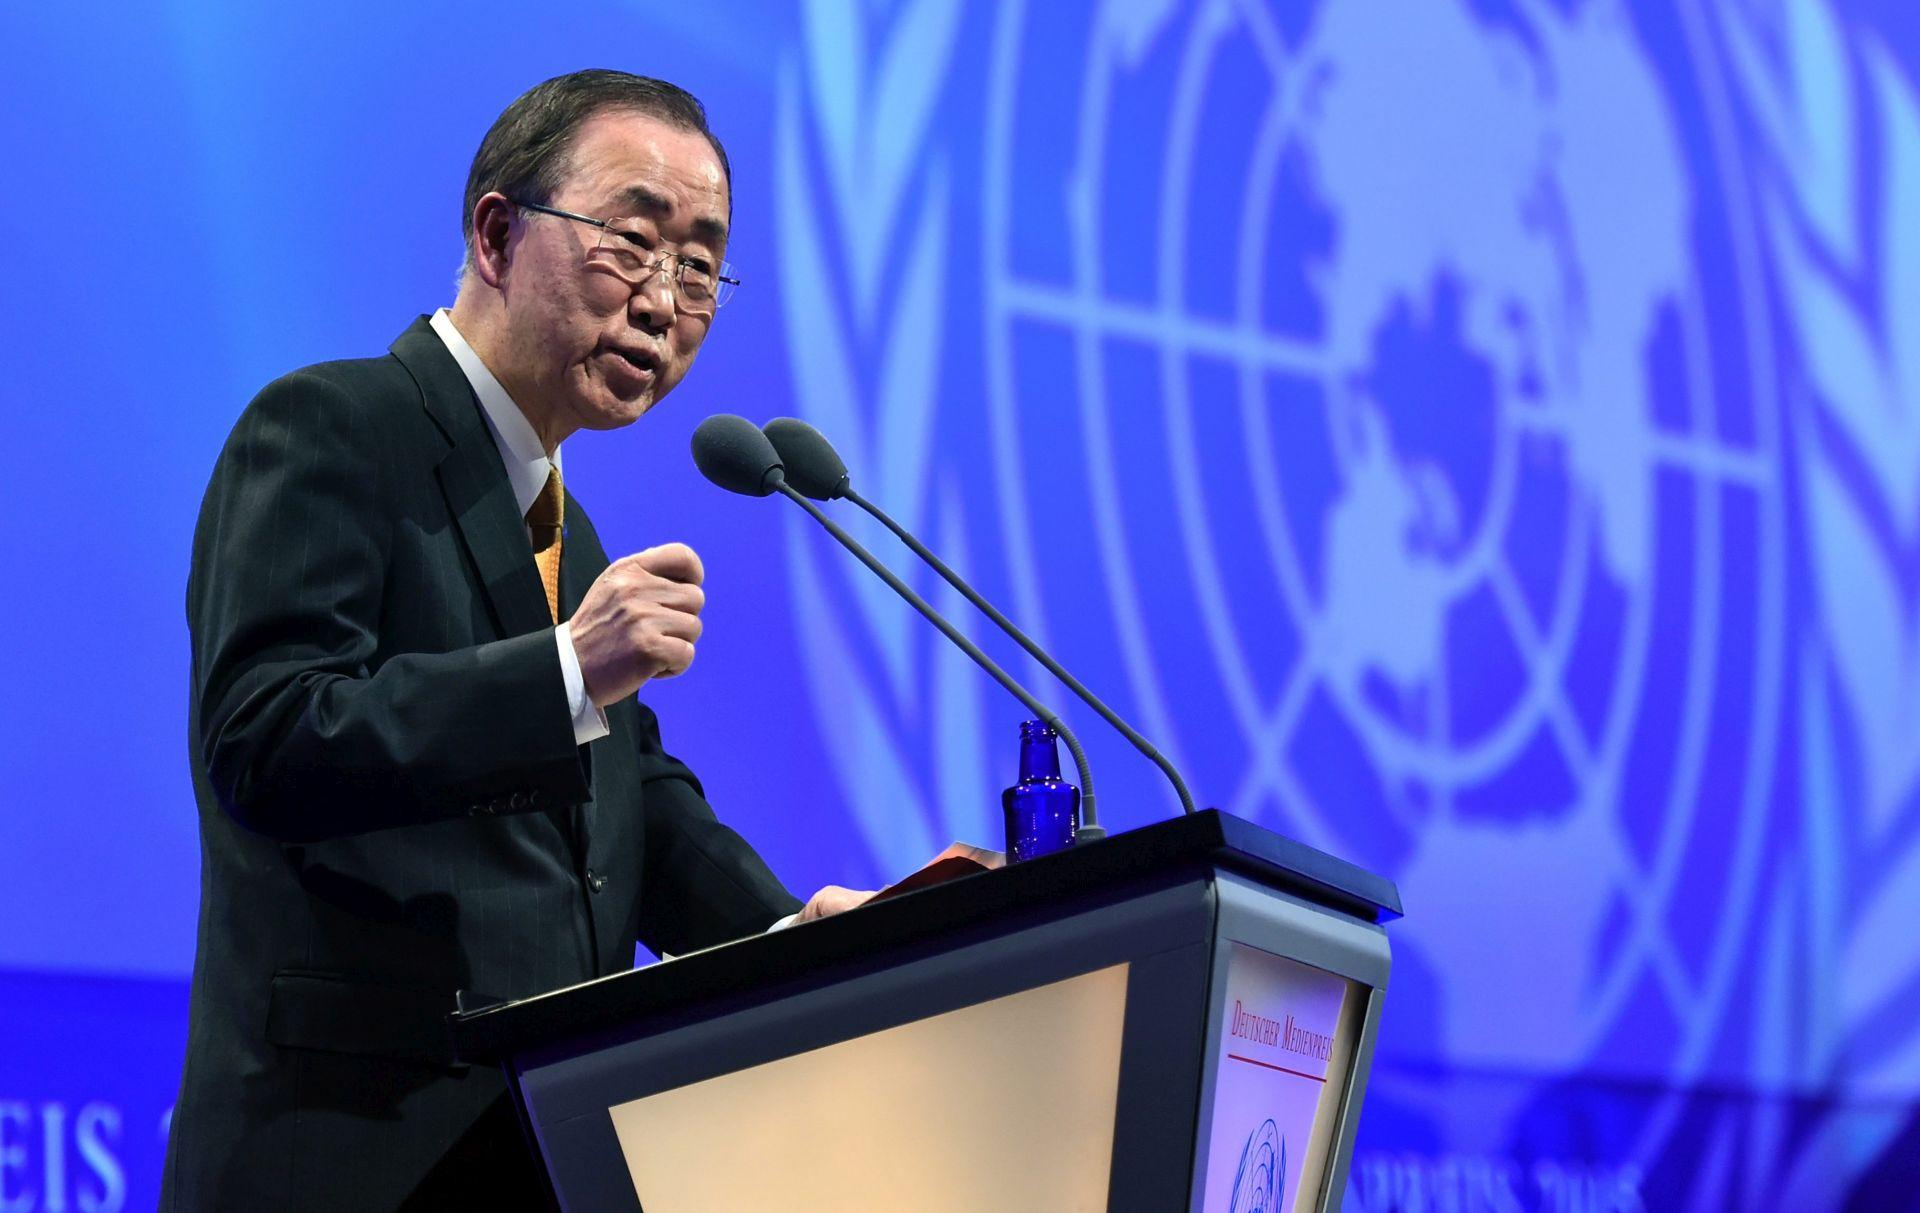 POZIV NA MIROVNE RAZGOVORE: Ban Ki-moona duboko zabrinjava nasilje u Siriji